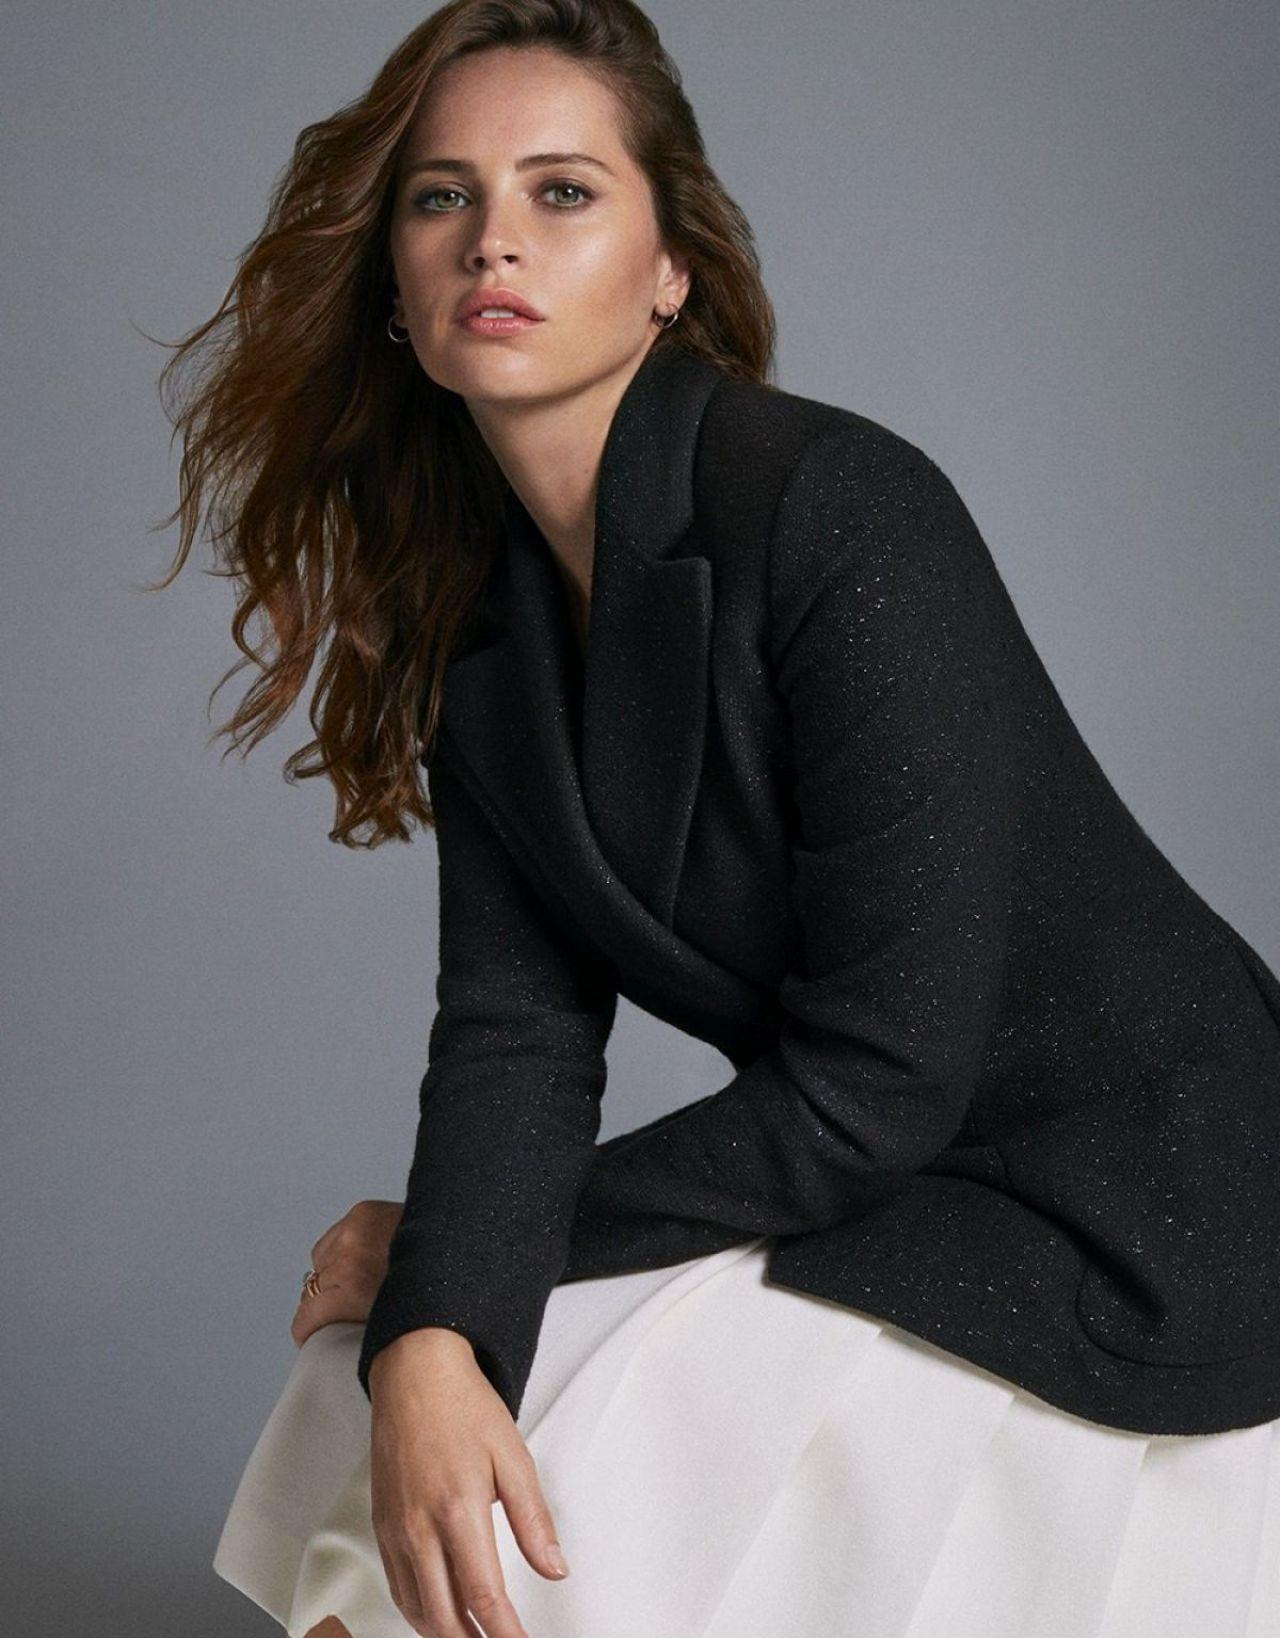 https://celebmafia.com/wp-content/uploads/2018/11/felicity-jones-s-magazine-winter-2019-3.jpg